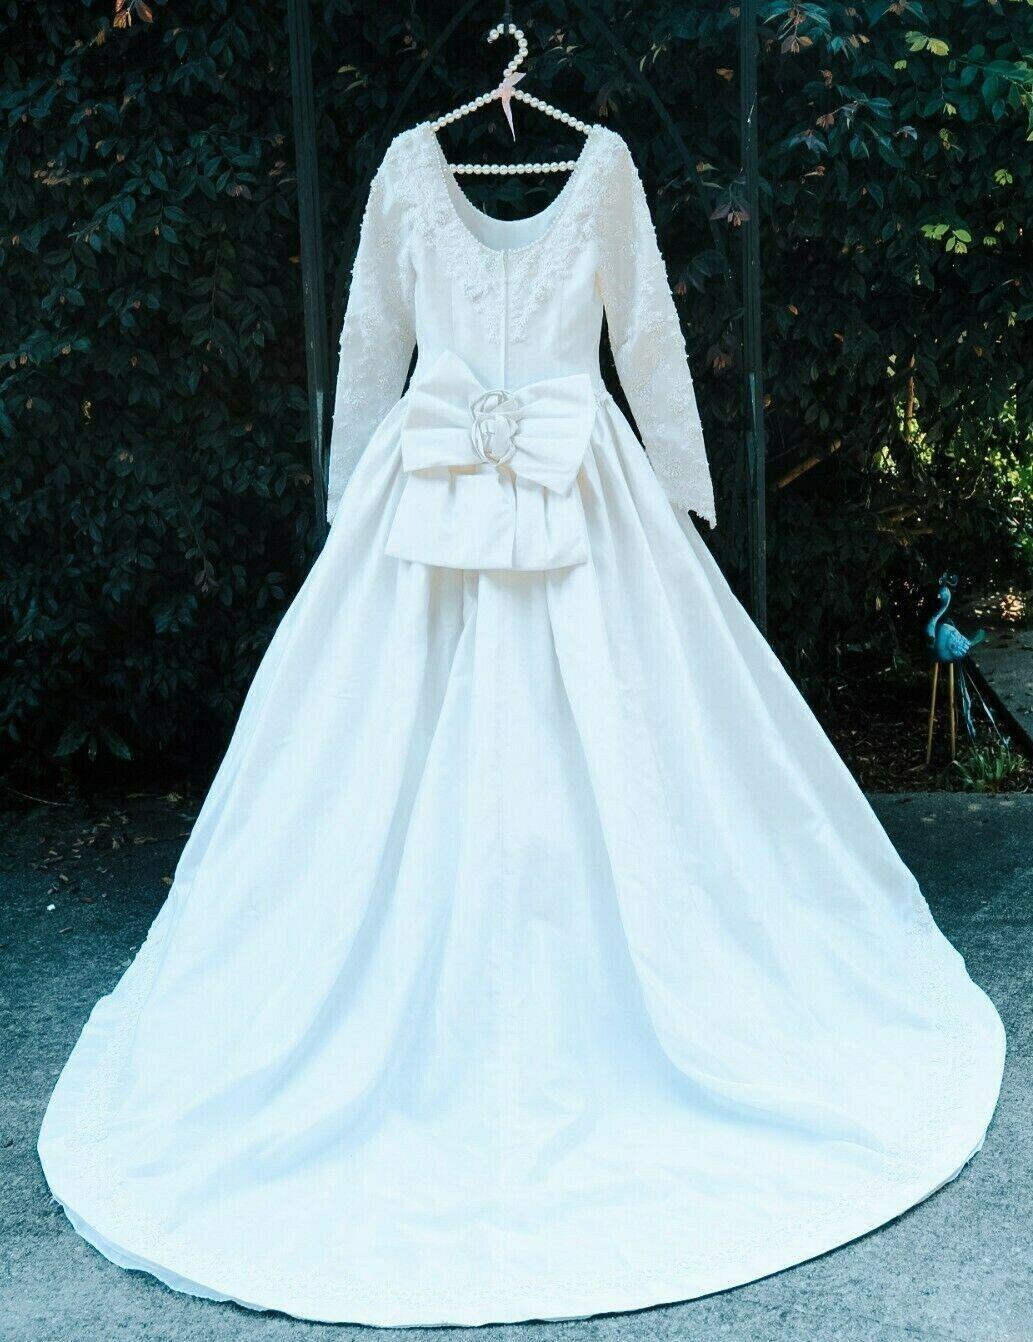 Wedding Dress by Demetrios, pale cream off white silk size 6 RN 78559